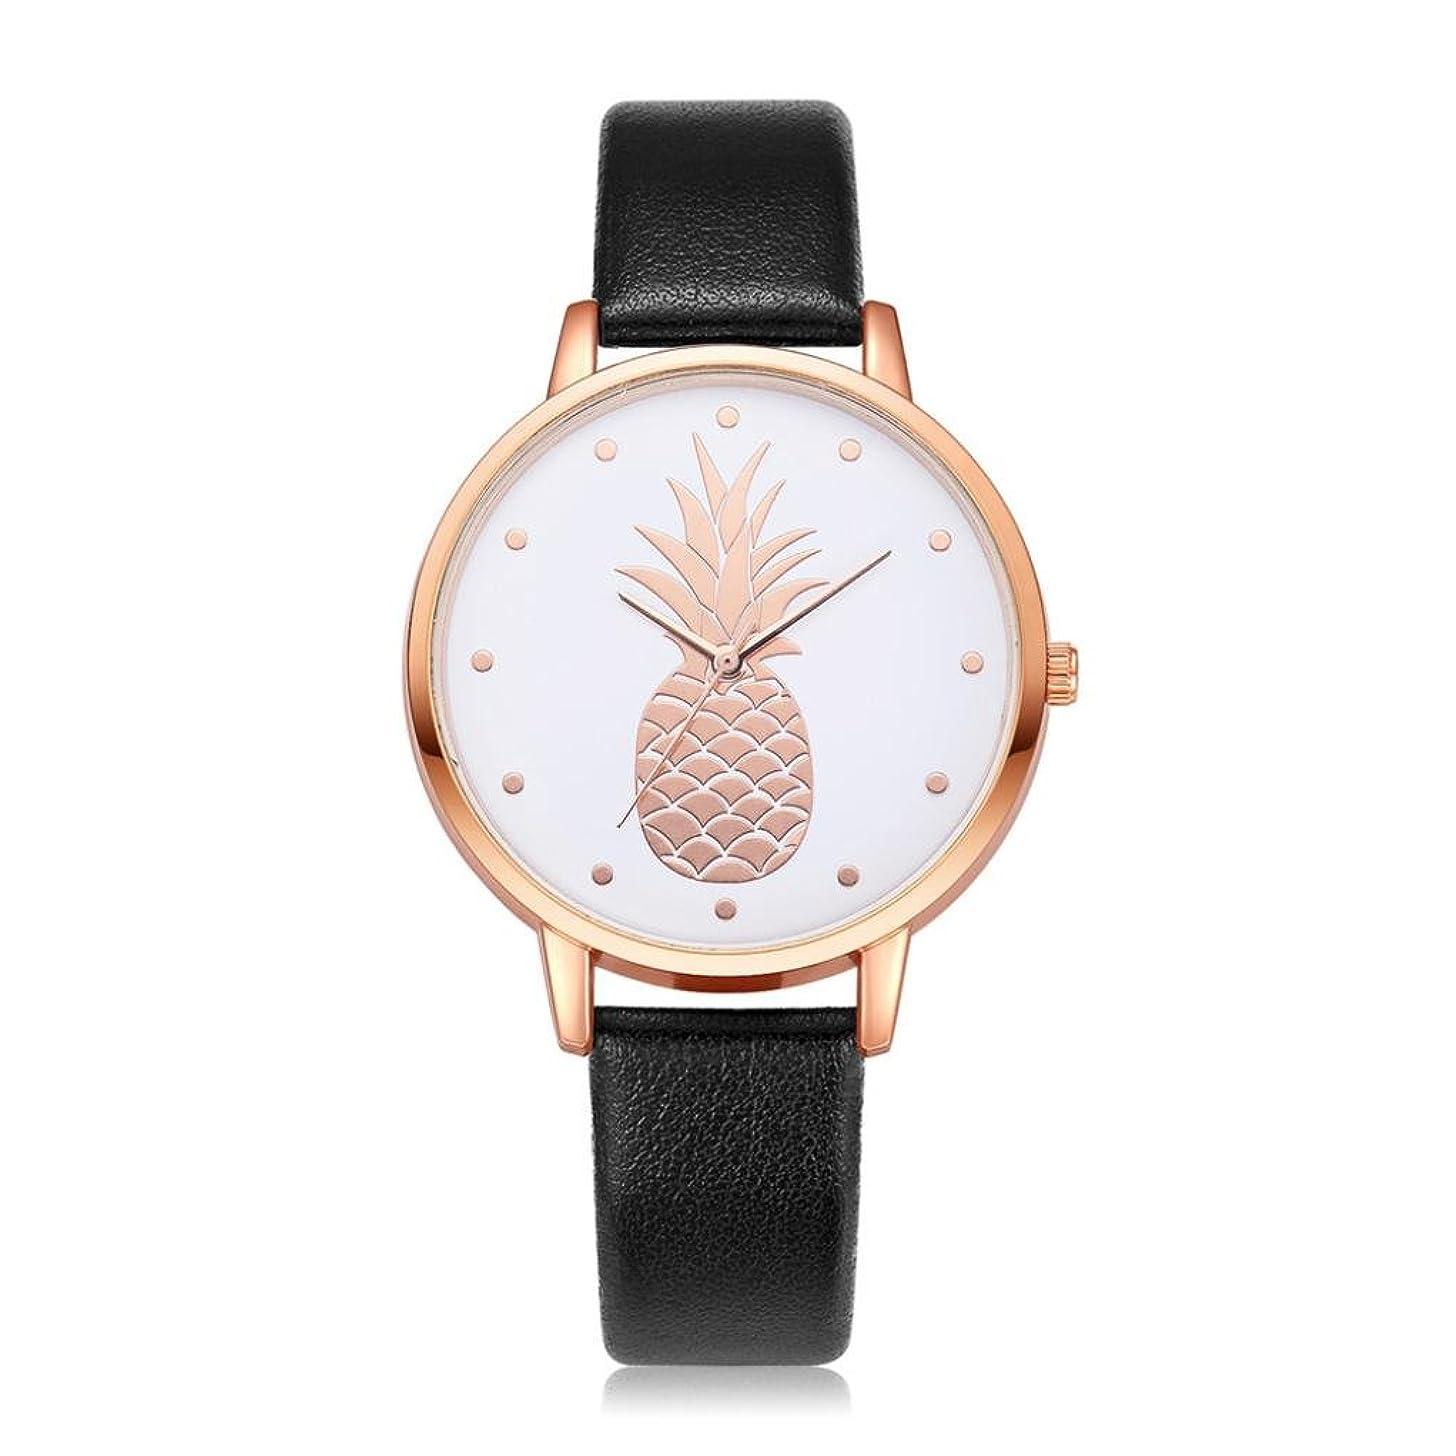 Swyss Women's Simple Fashion Watch Cute Pineapple Pattern Dial Leather Analog Quartz Wrist Watch Chic Sweet Style (D)